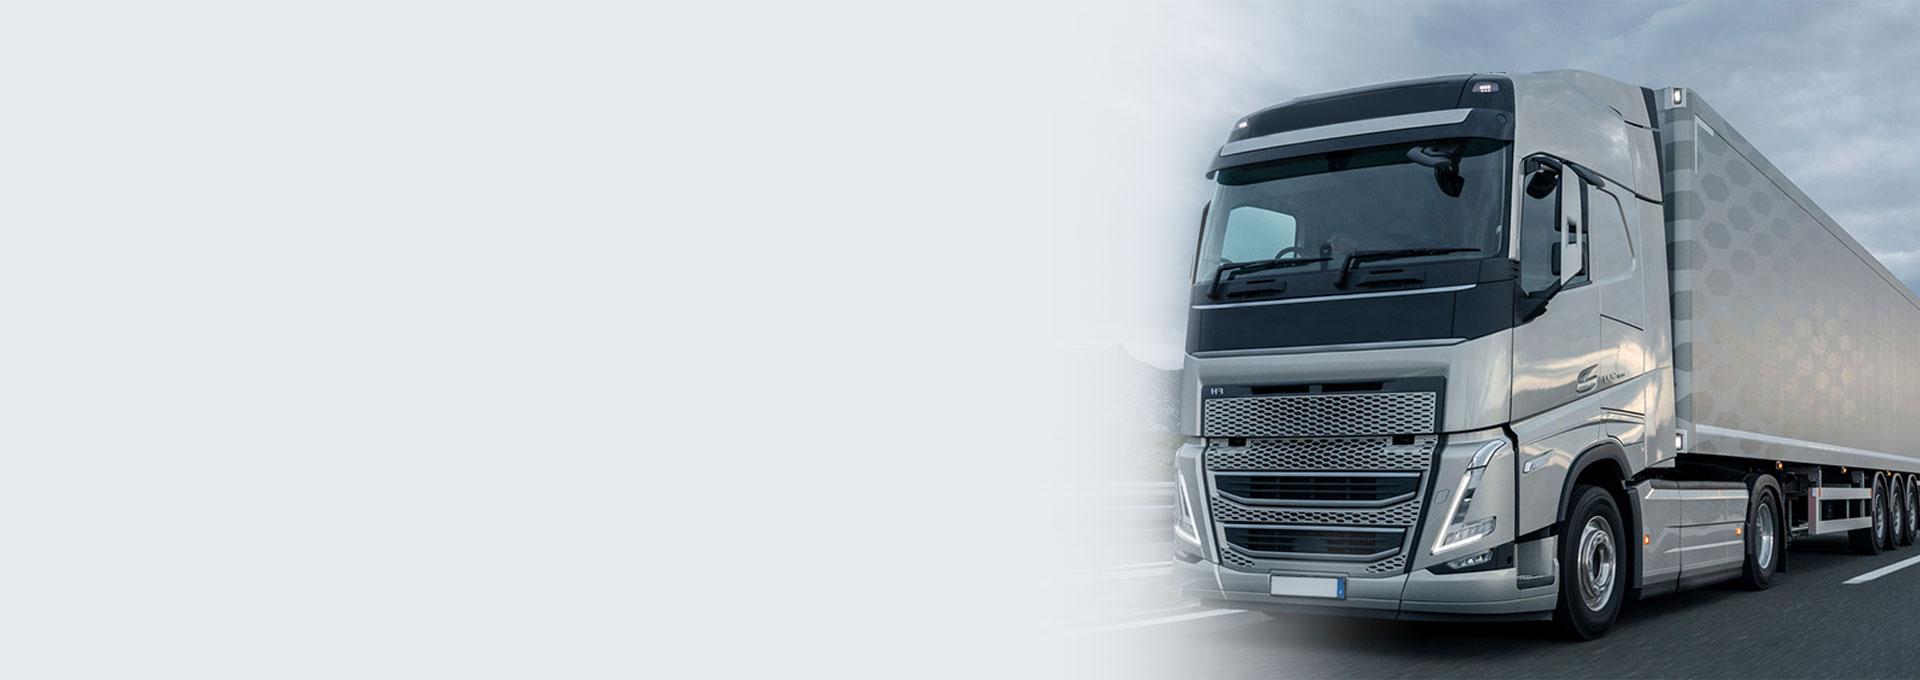 online ασφάλεια φορτηγού